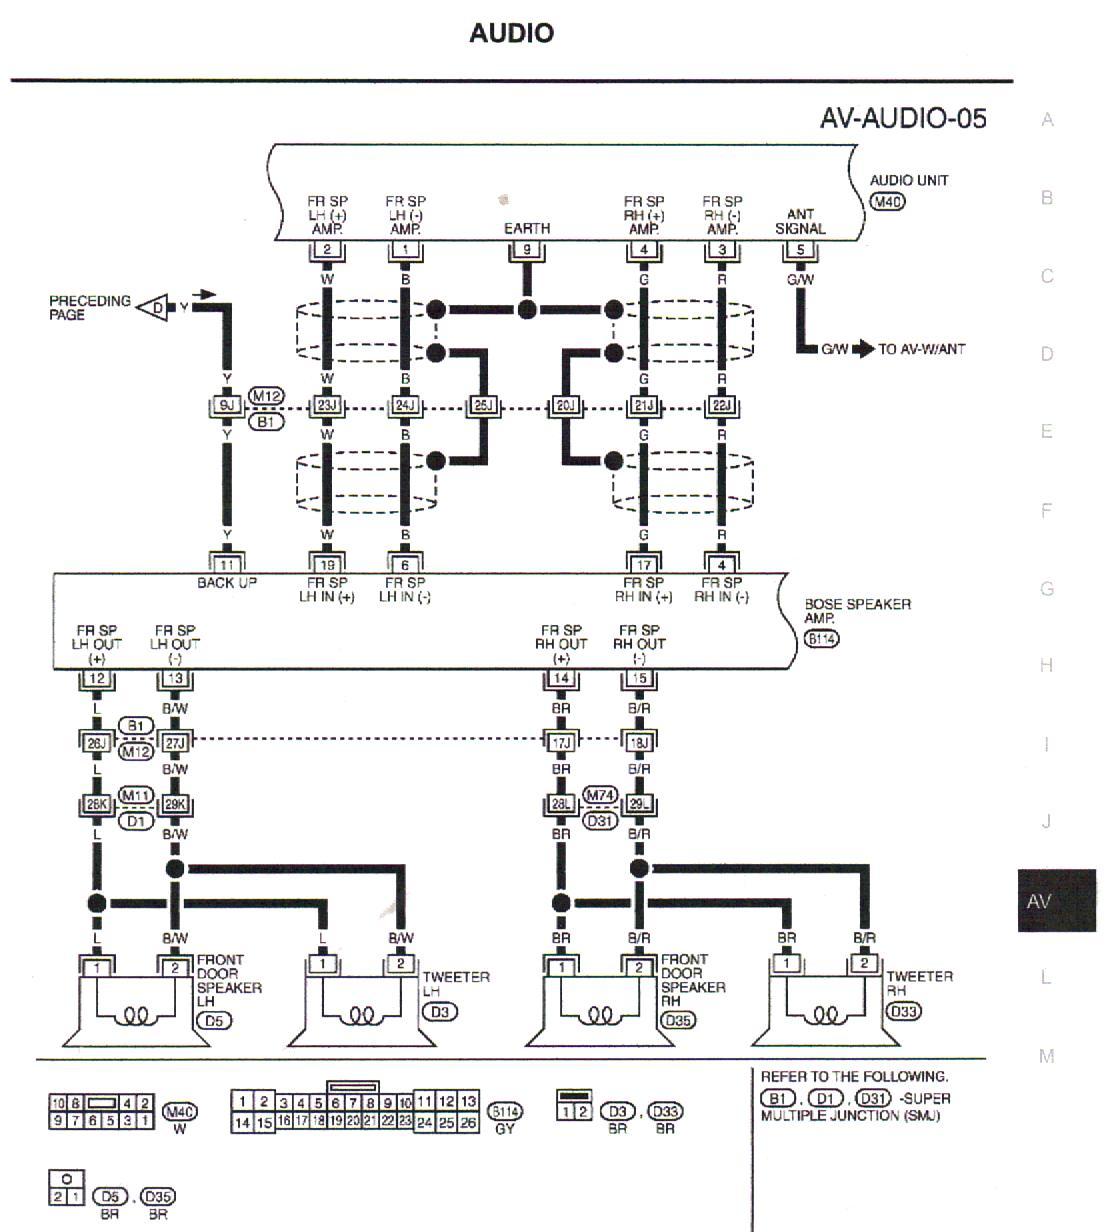 Amazing Infiniti G37 Wiring Diagram Carbonvote Mudit Blog Wiring Cloud Eachirenstrafr09Org